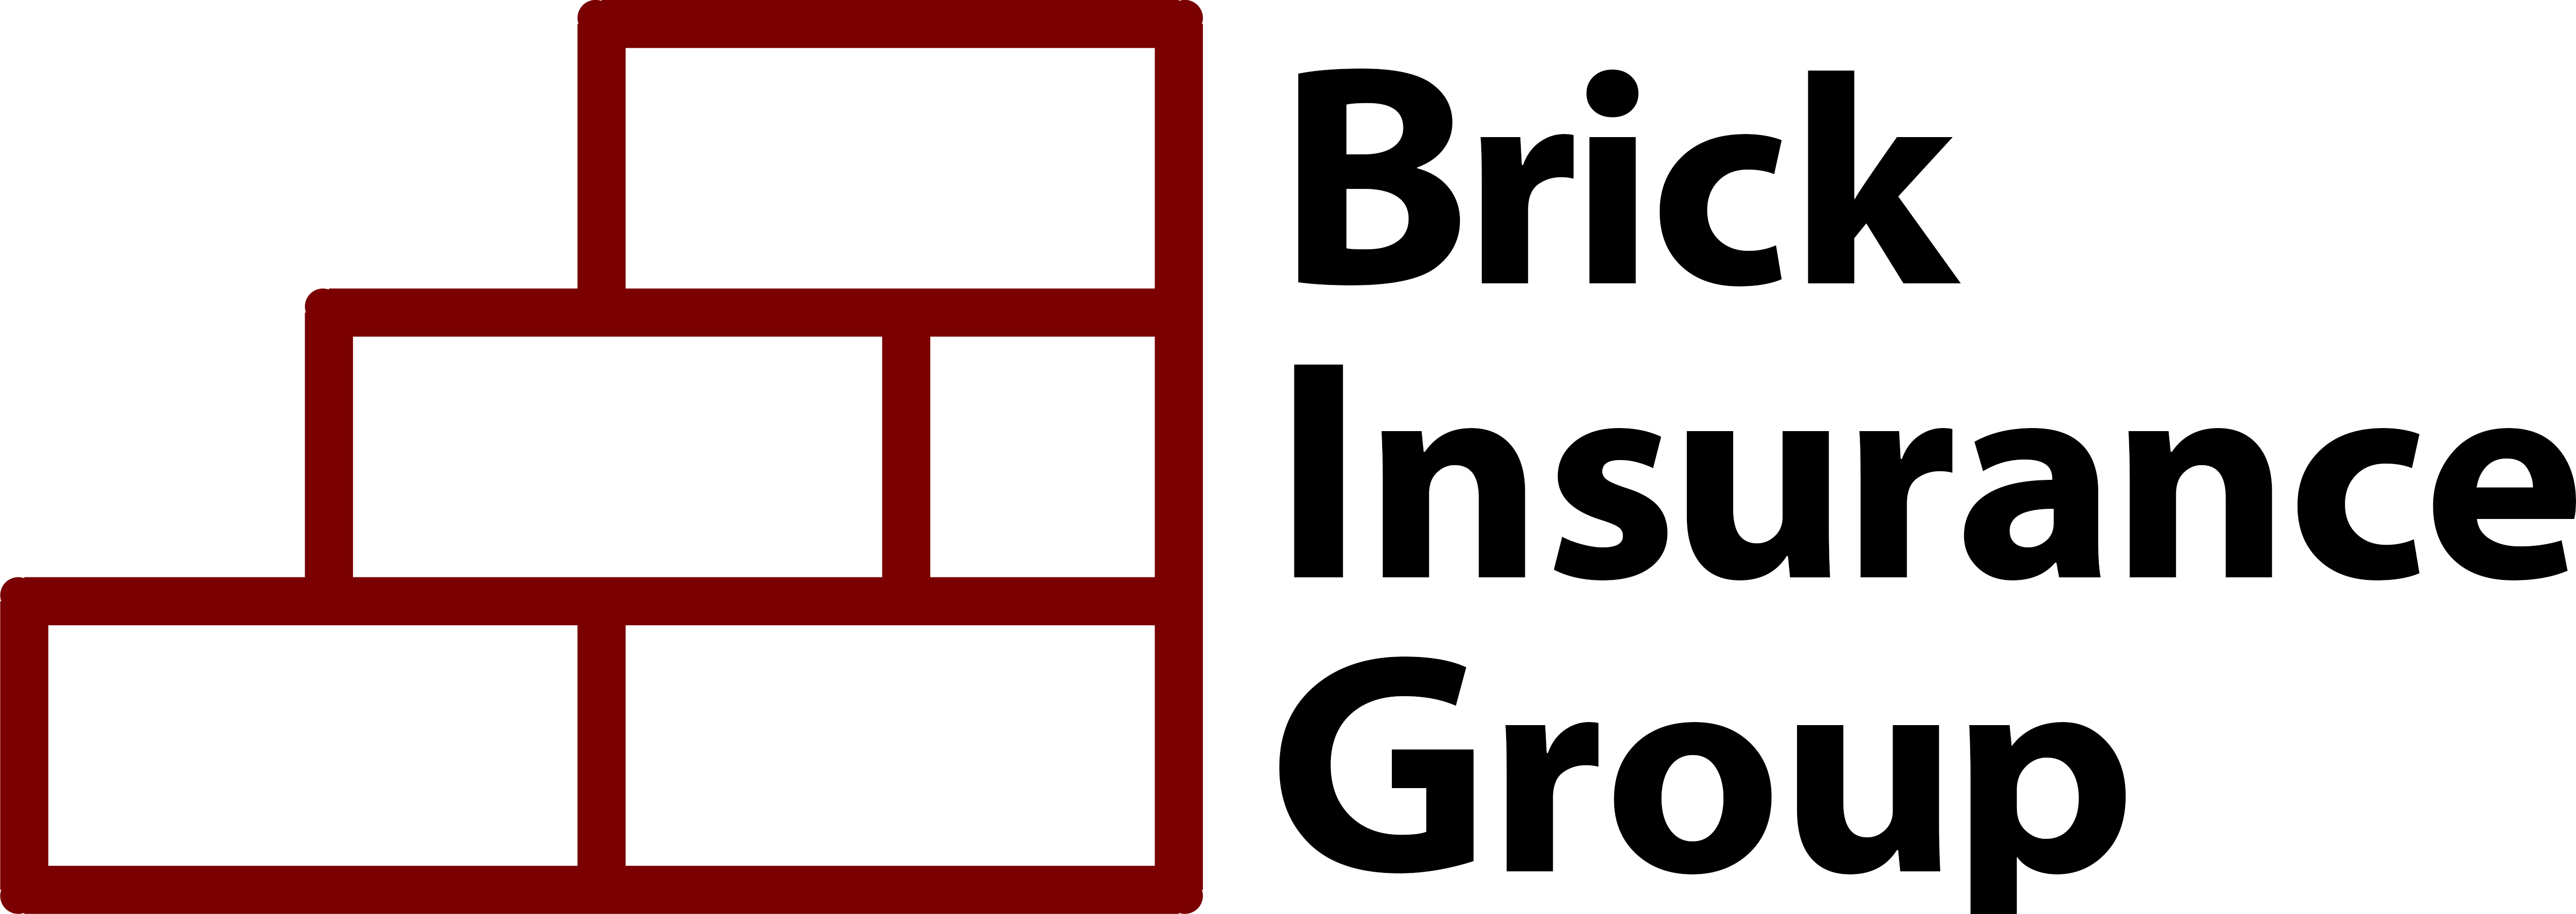 Brick Insurance Group